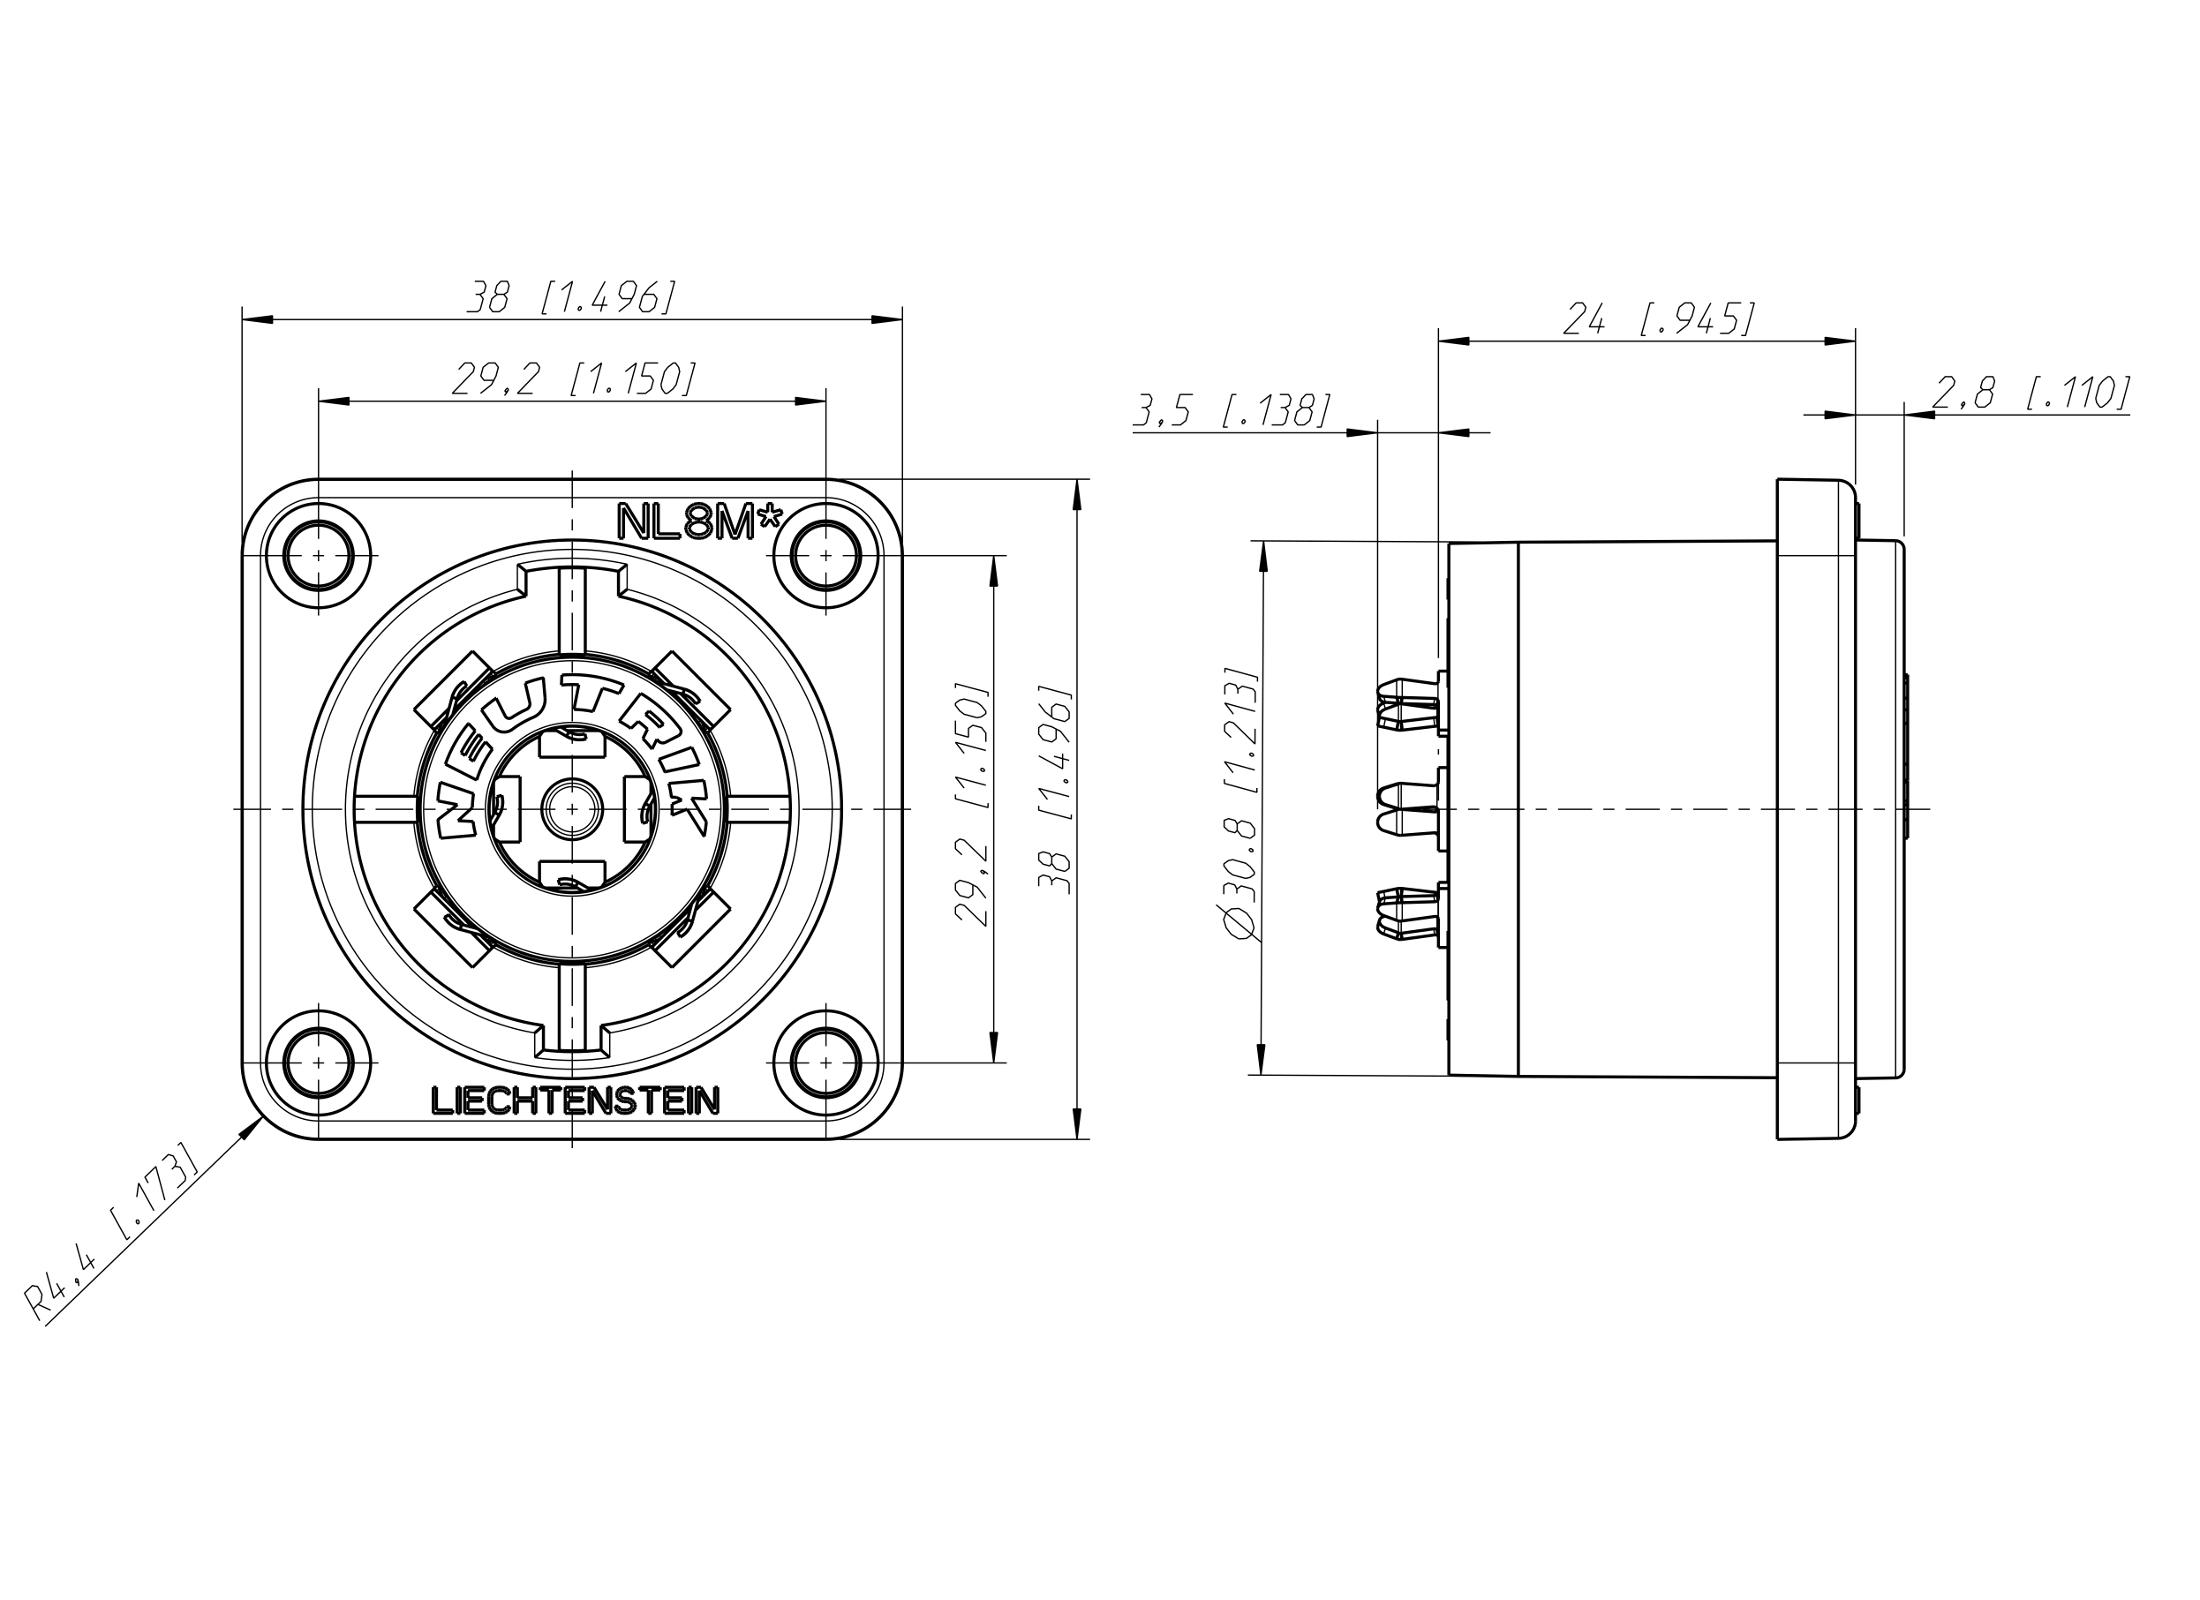 2 Pole Speakon Wiring Diagram  Pole Speakon Nl Fc Wiring Diagram on